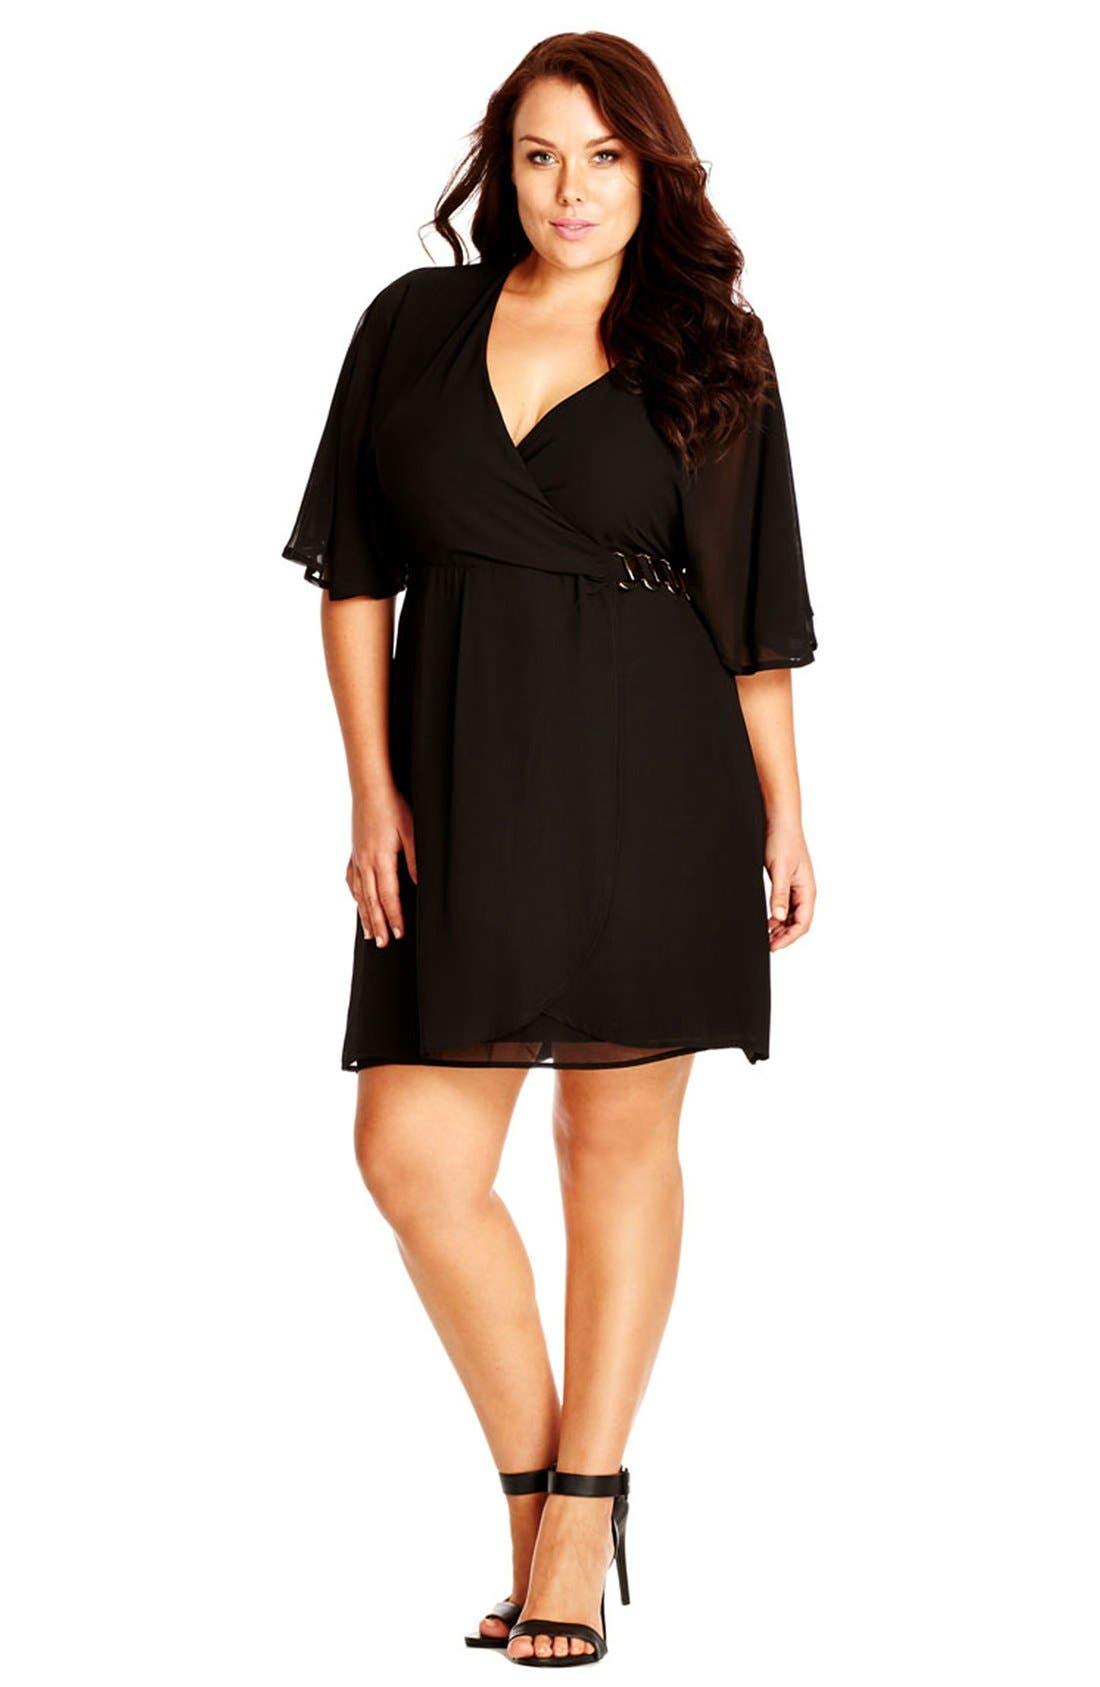 Alternate Image 1 Selected - City Chic 'Class' Chiffon Wrap Dress (Plus Size)